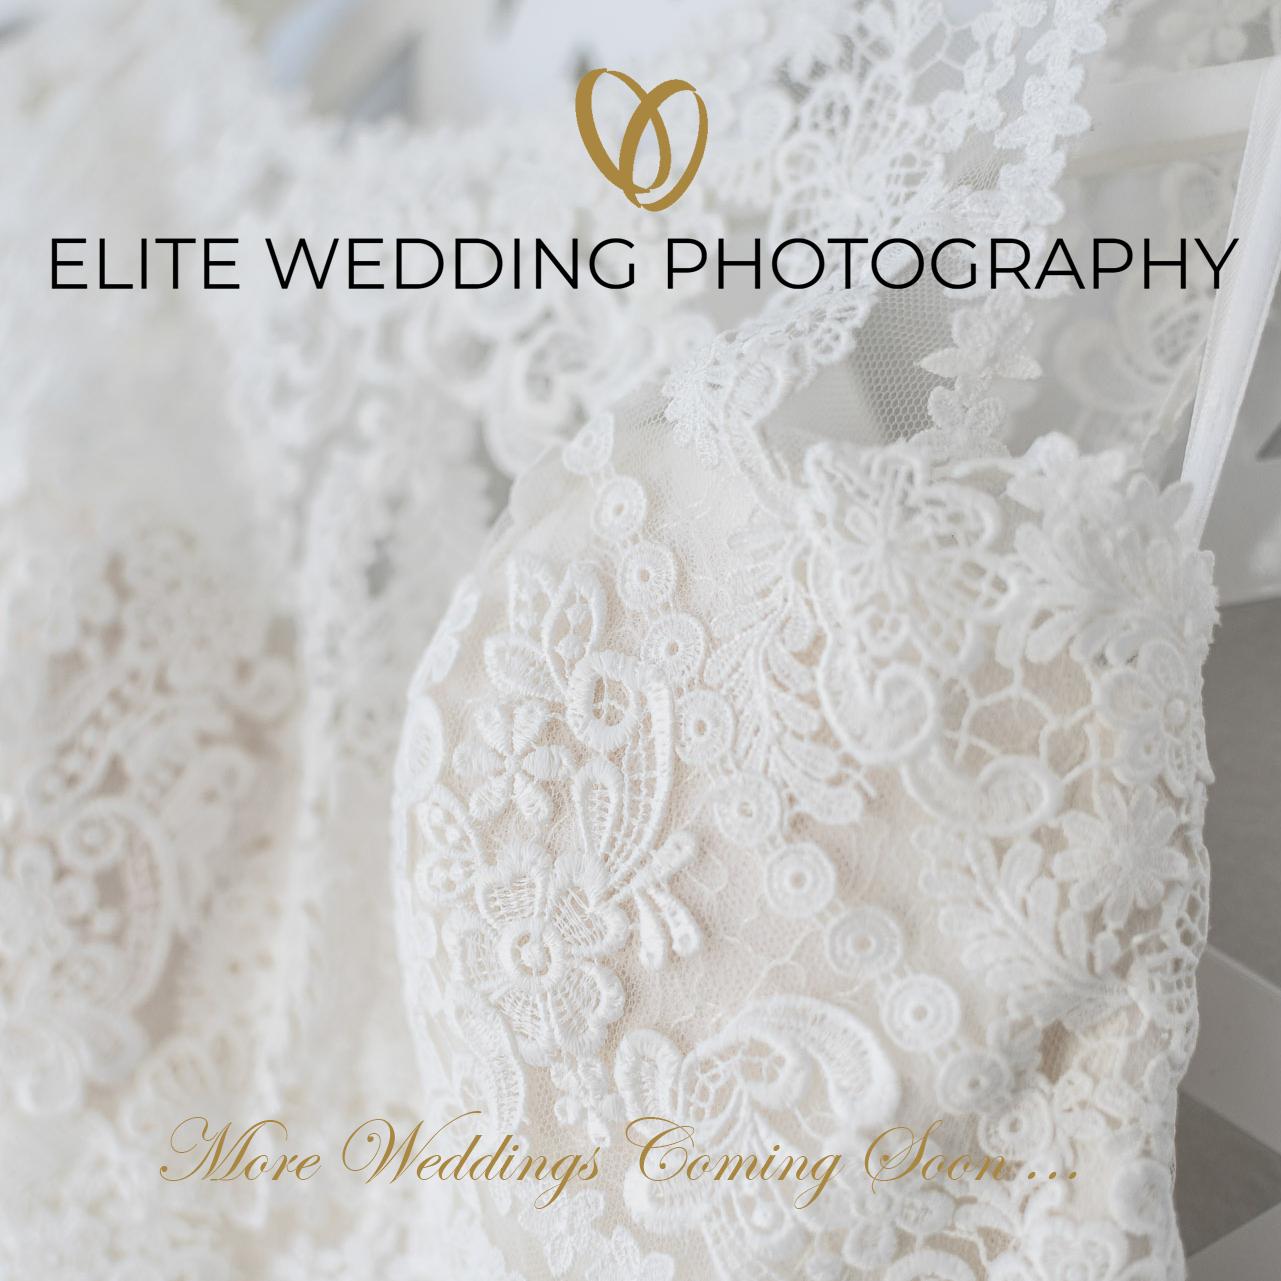 ELITE-WEDDING-LOGO3.jpg